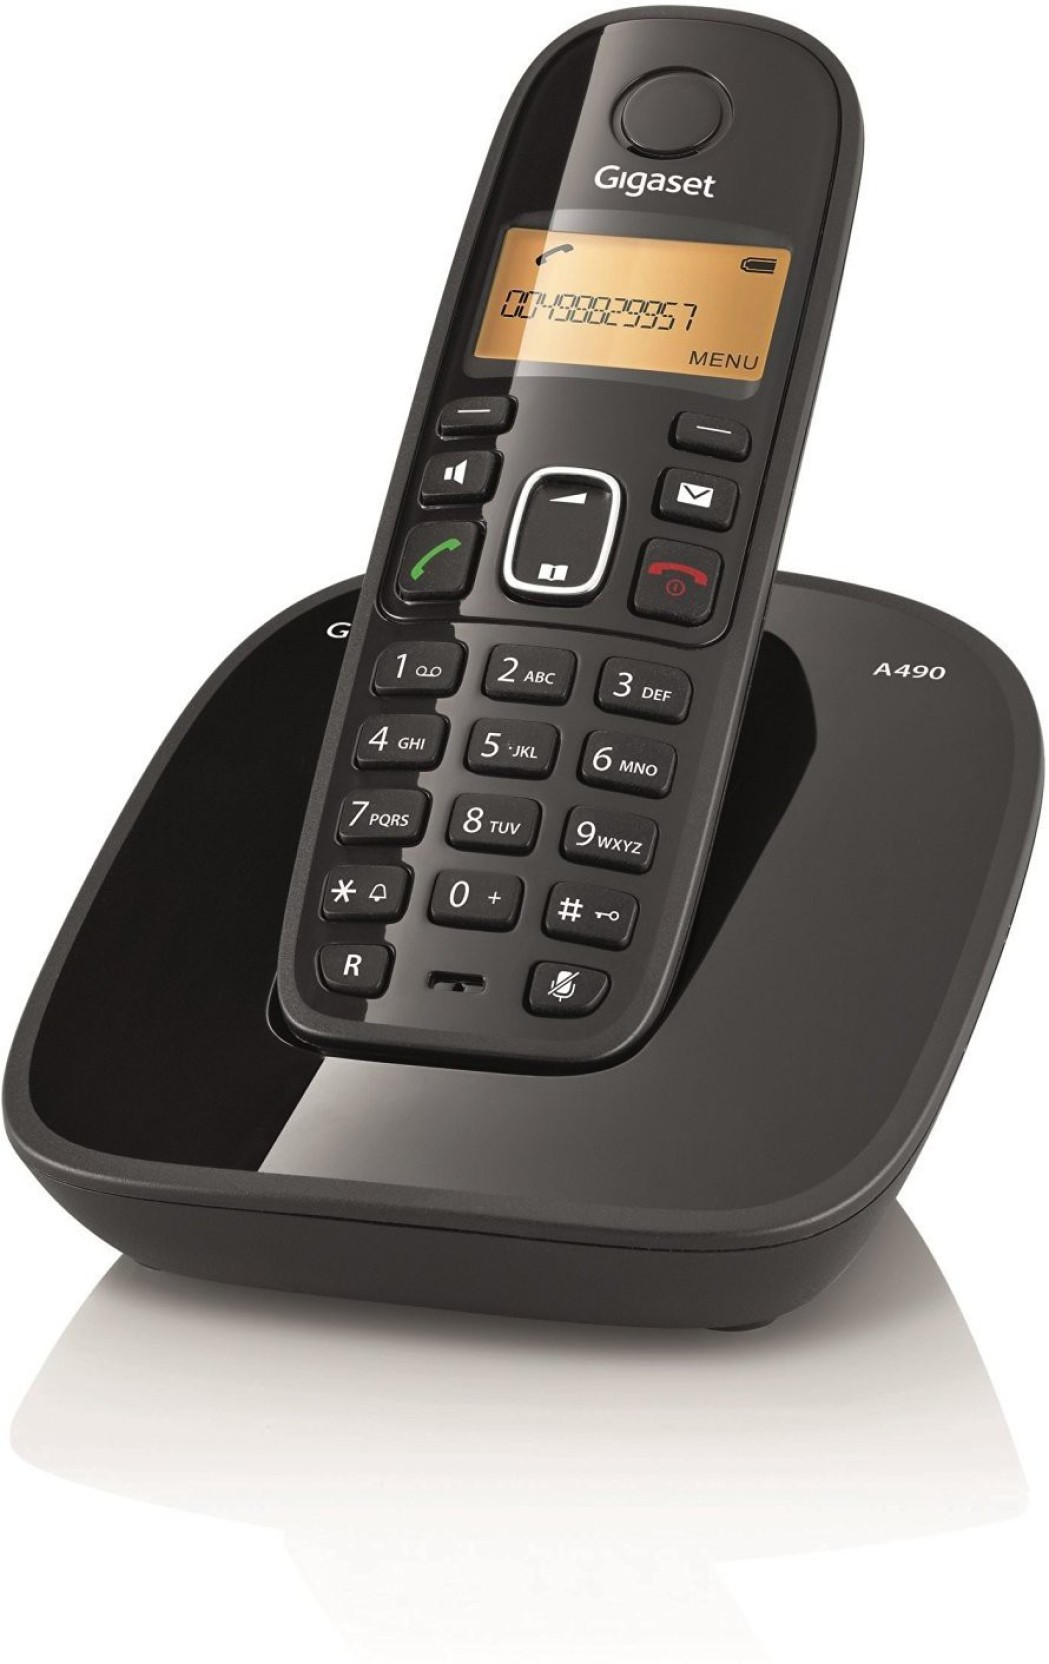 Gigaset A490 Cordless Landline Phone Price In India Buy